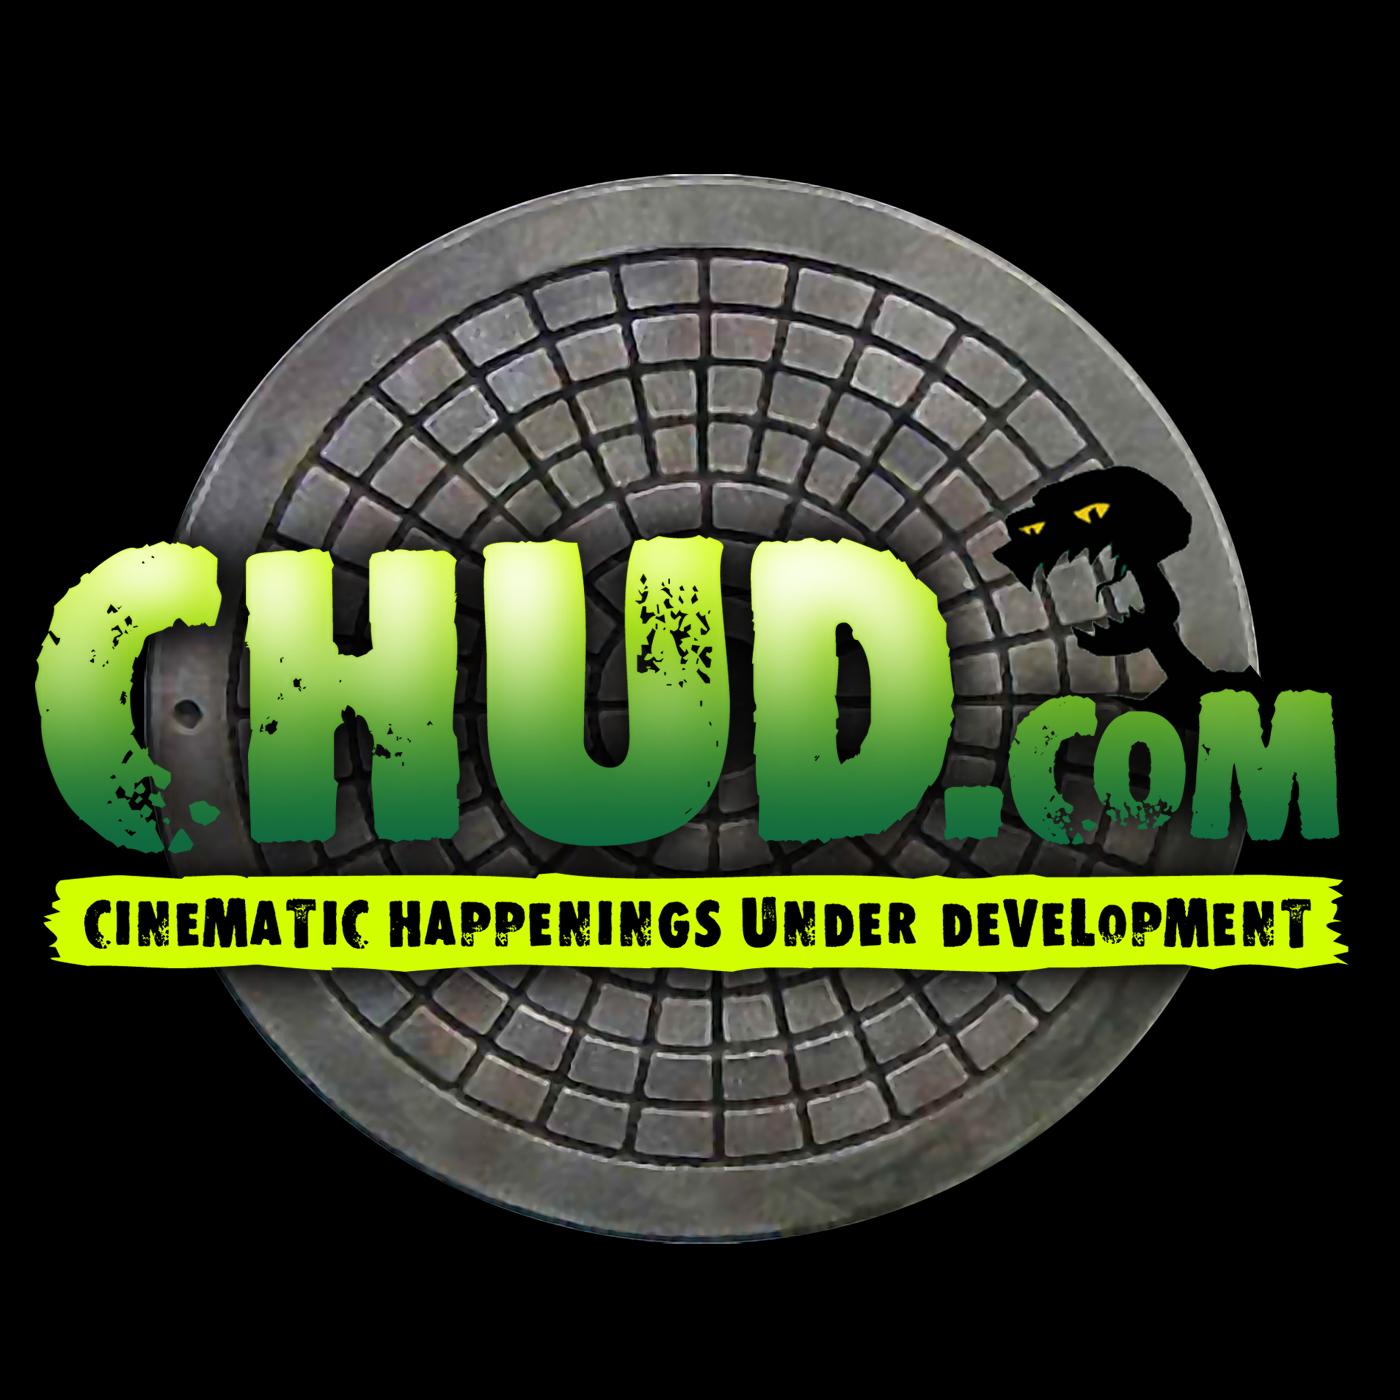 CHUD.com